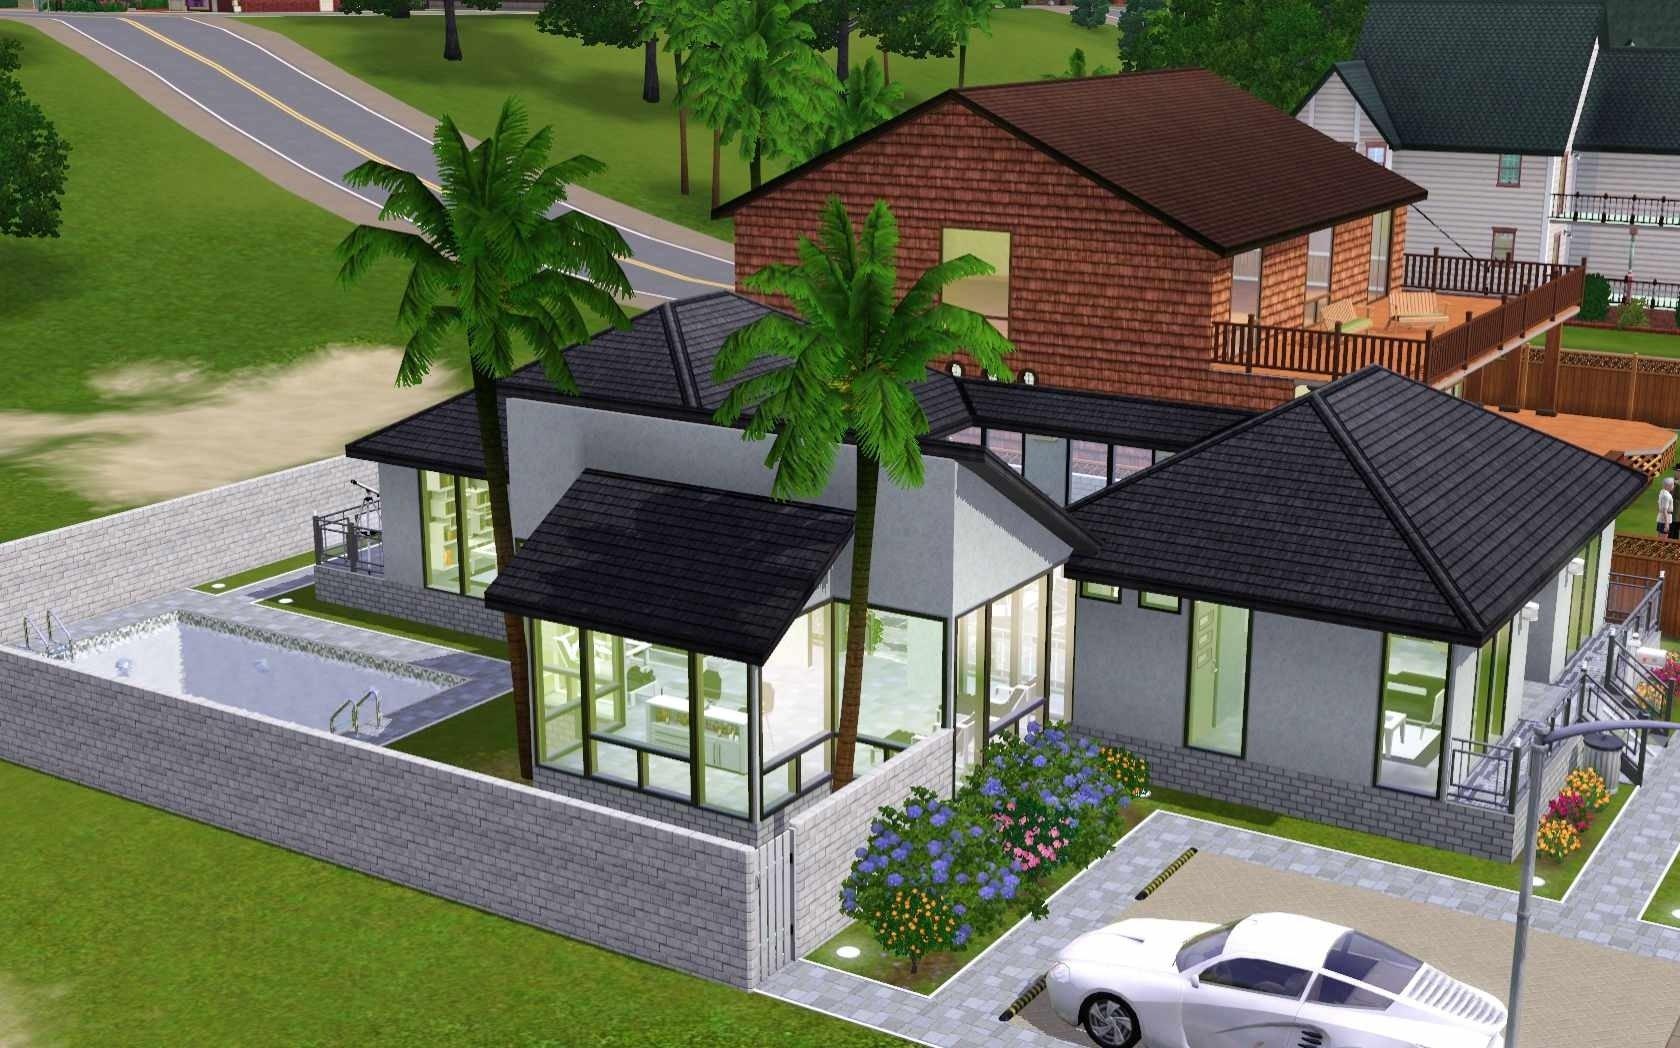 10 Stylish House Ideas For Sims 3